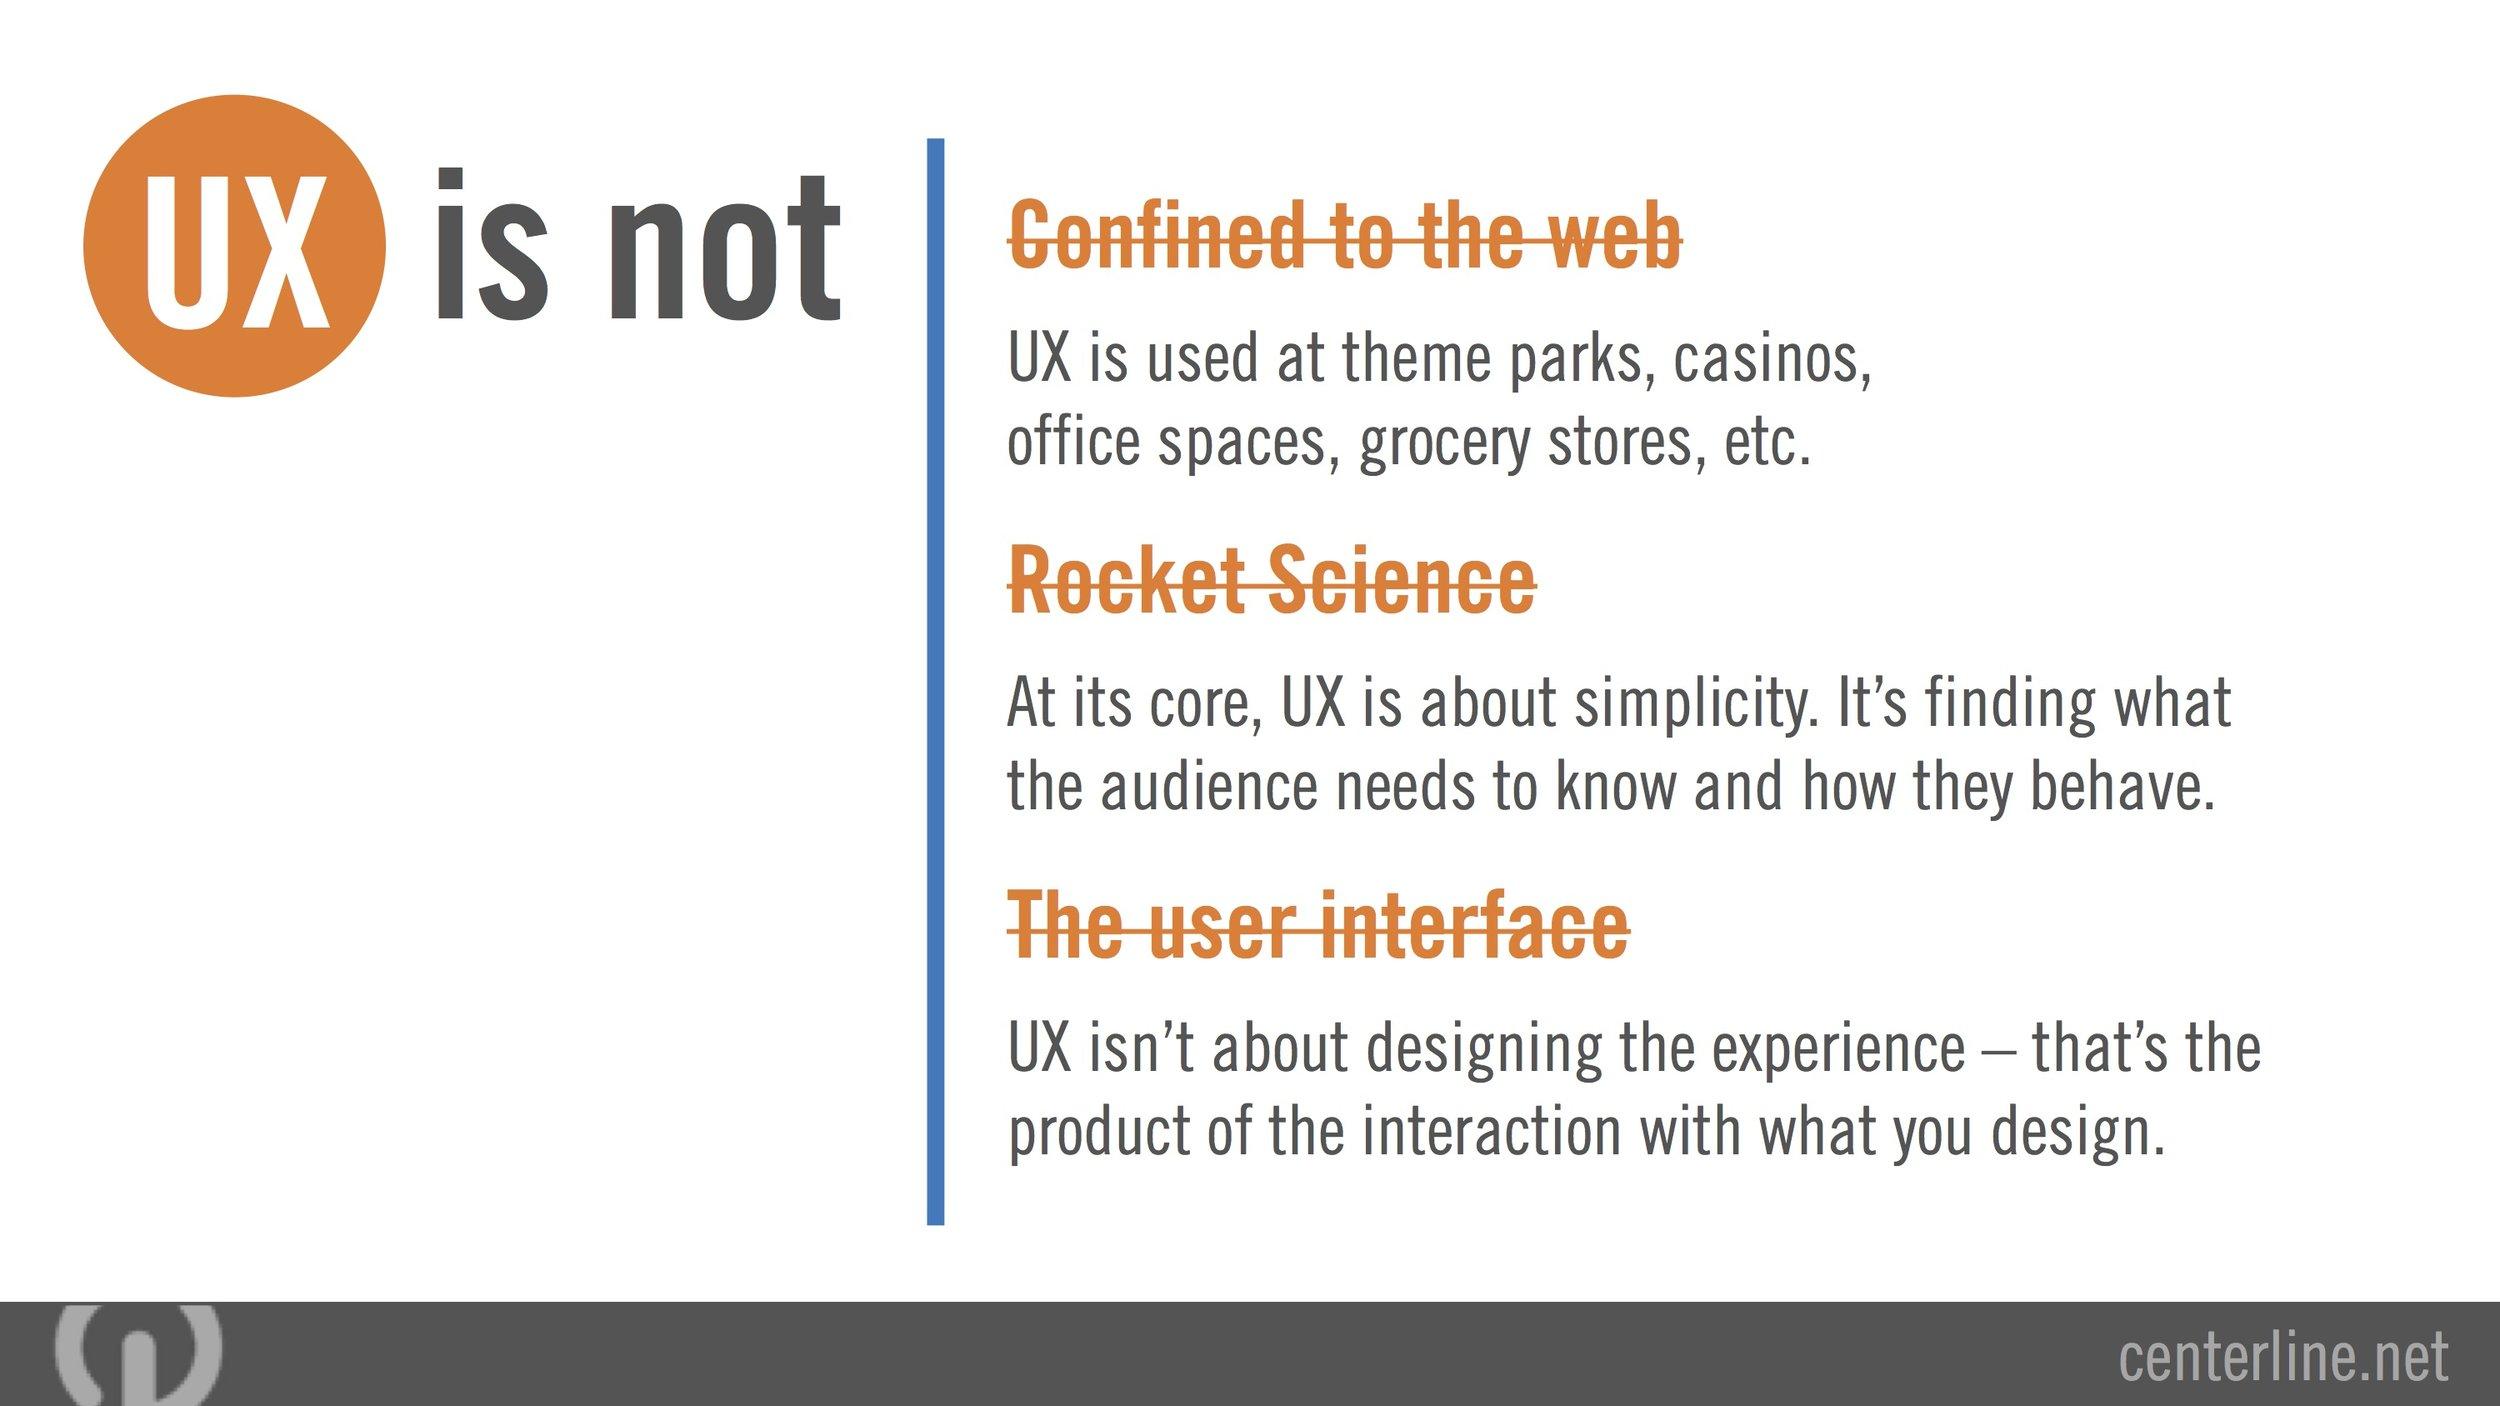 Why User Experience Matters Slideshare Presentation  Designed during my role as Marketing Coordinator/Graphic Designer at Centerline Digital.